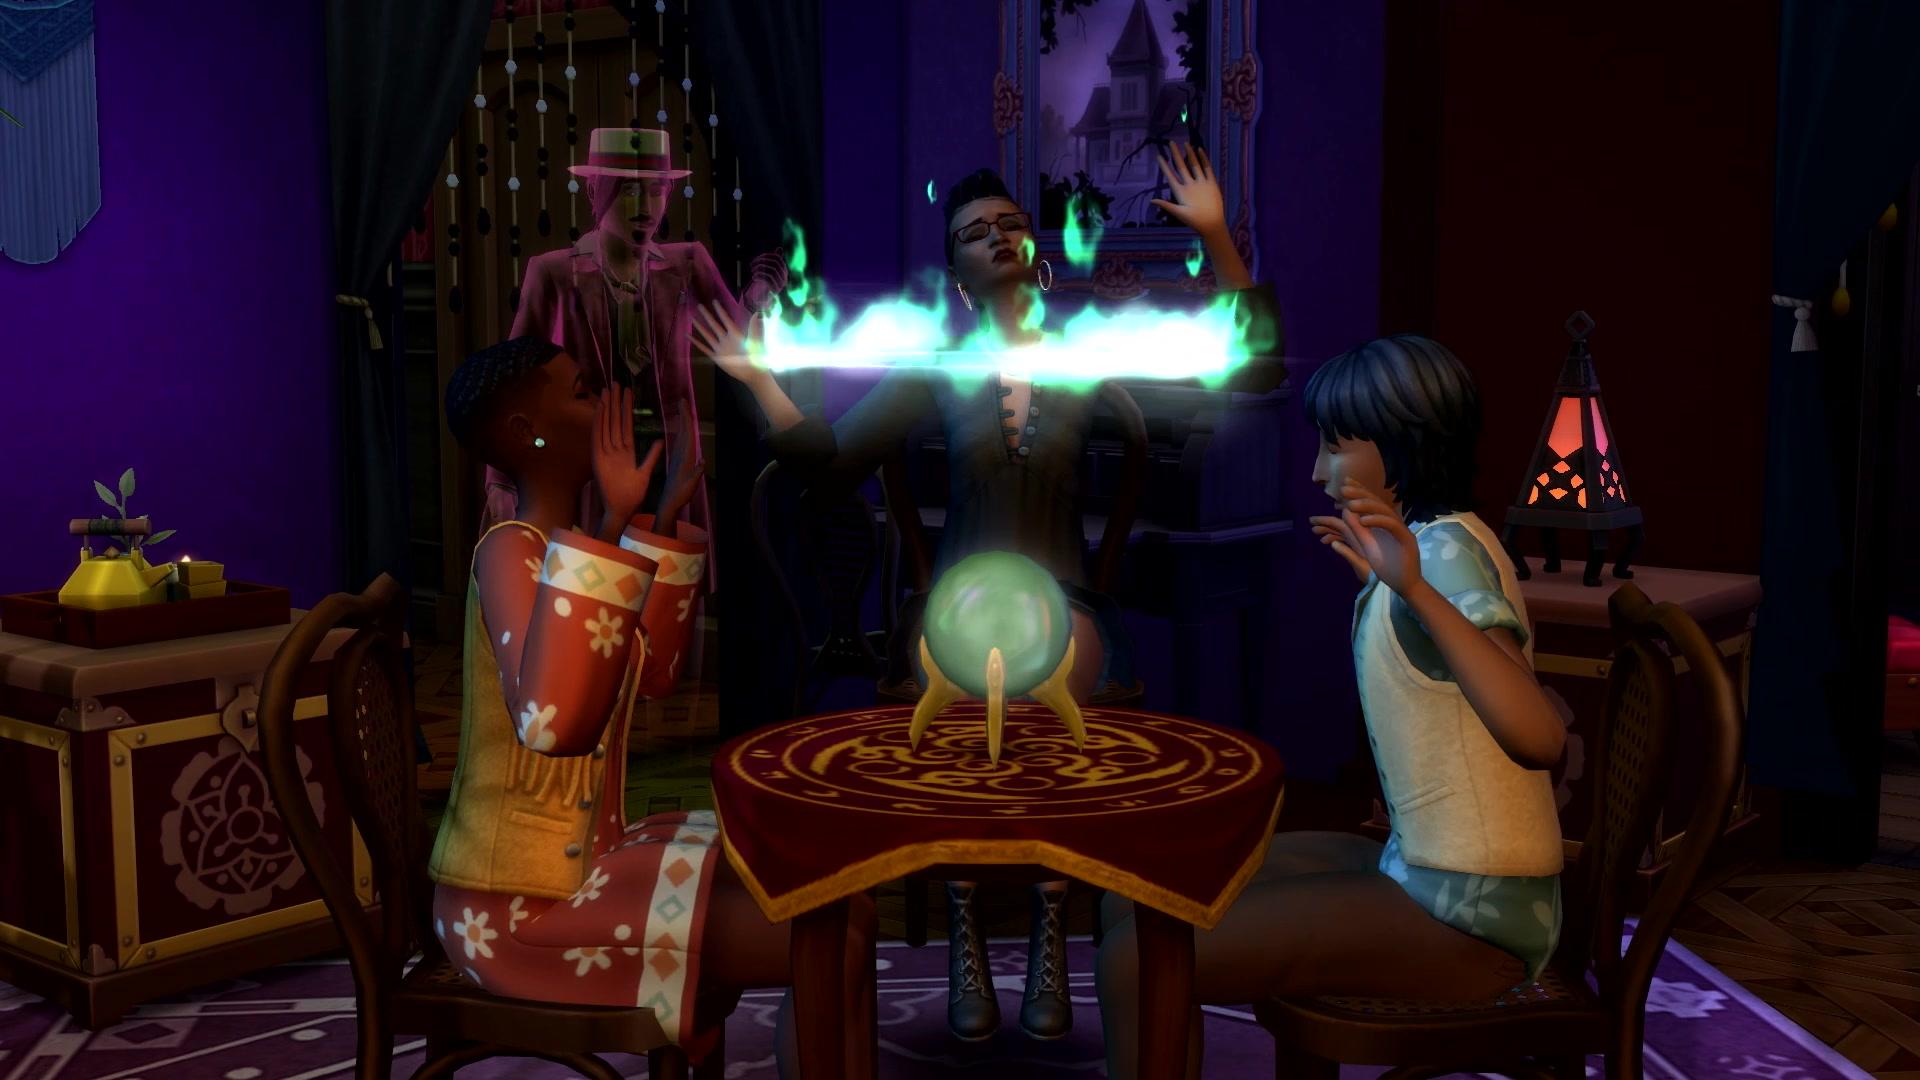 Medium   The Sims Wiki   Fandom